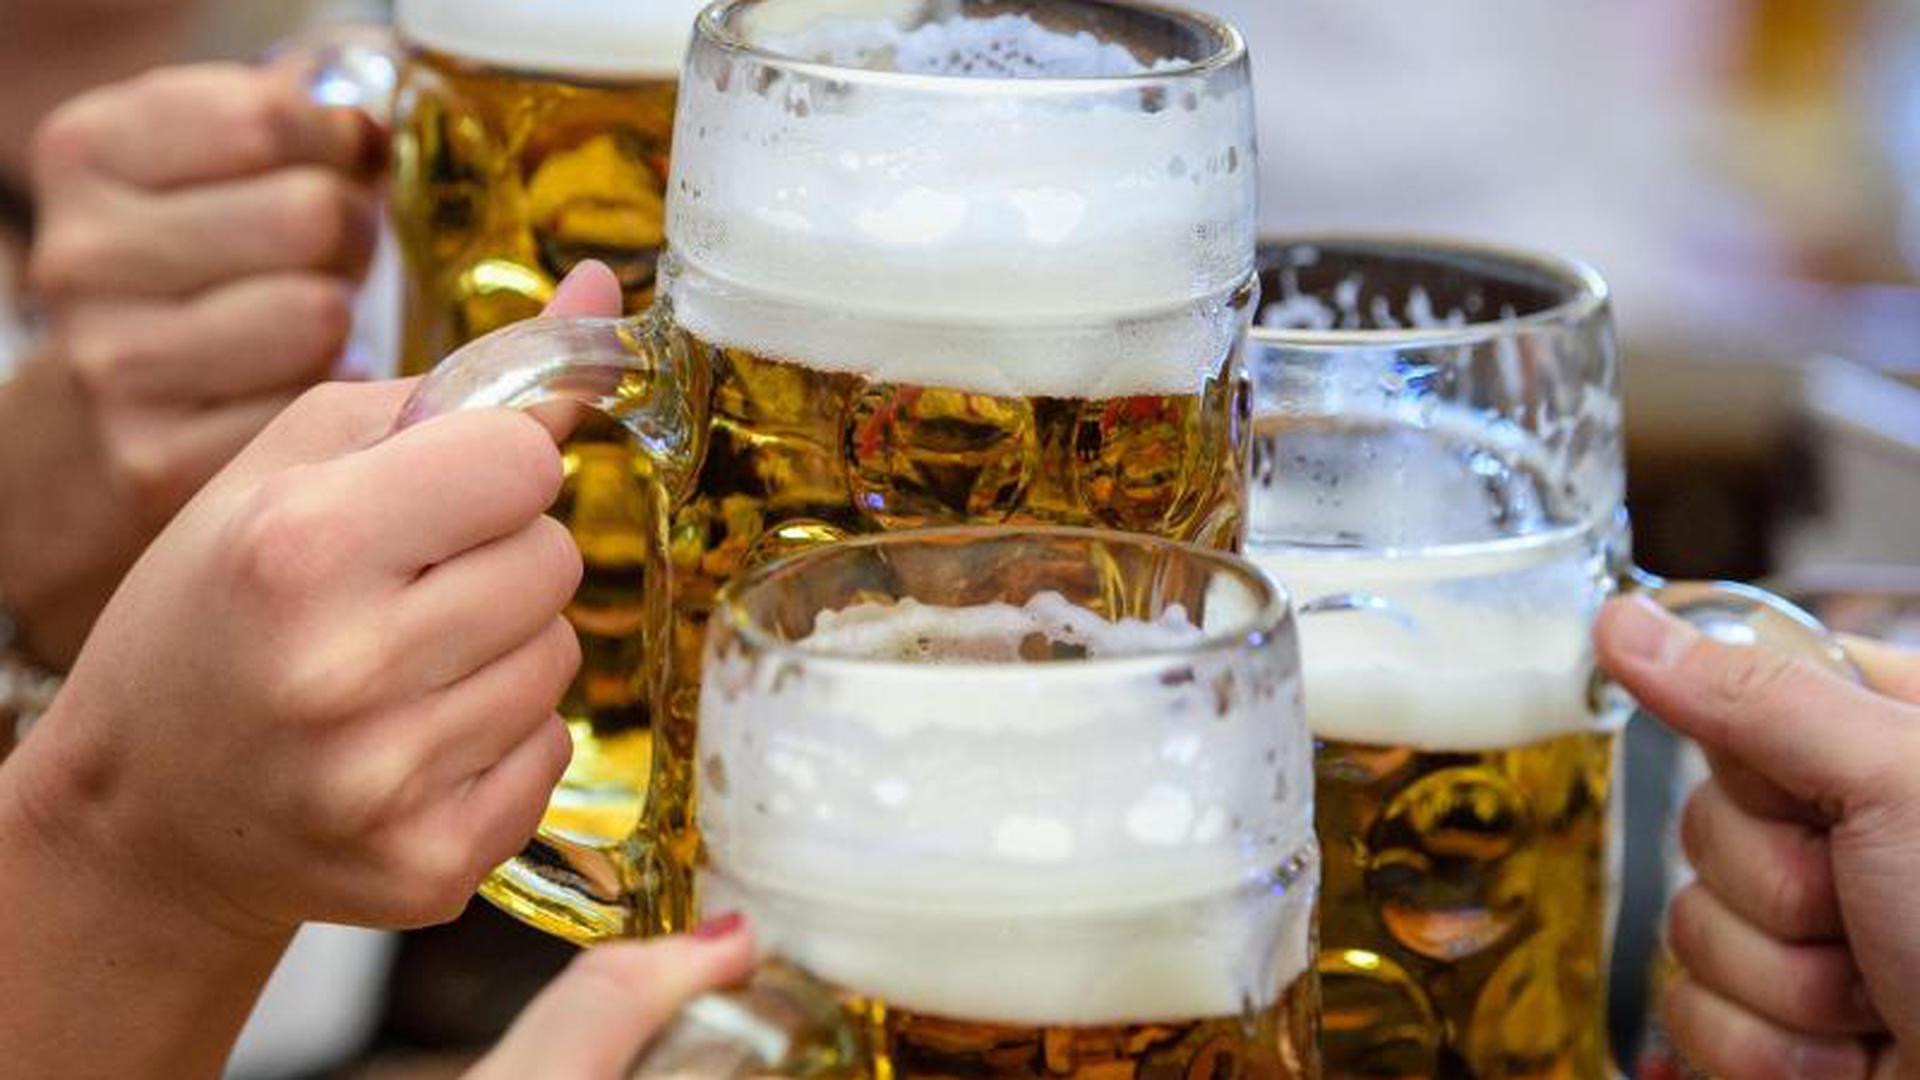 Bierabsatz schrumpft 2019